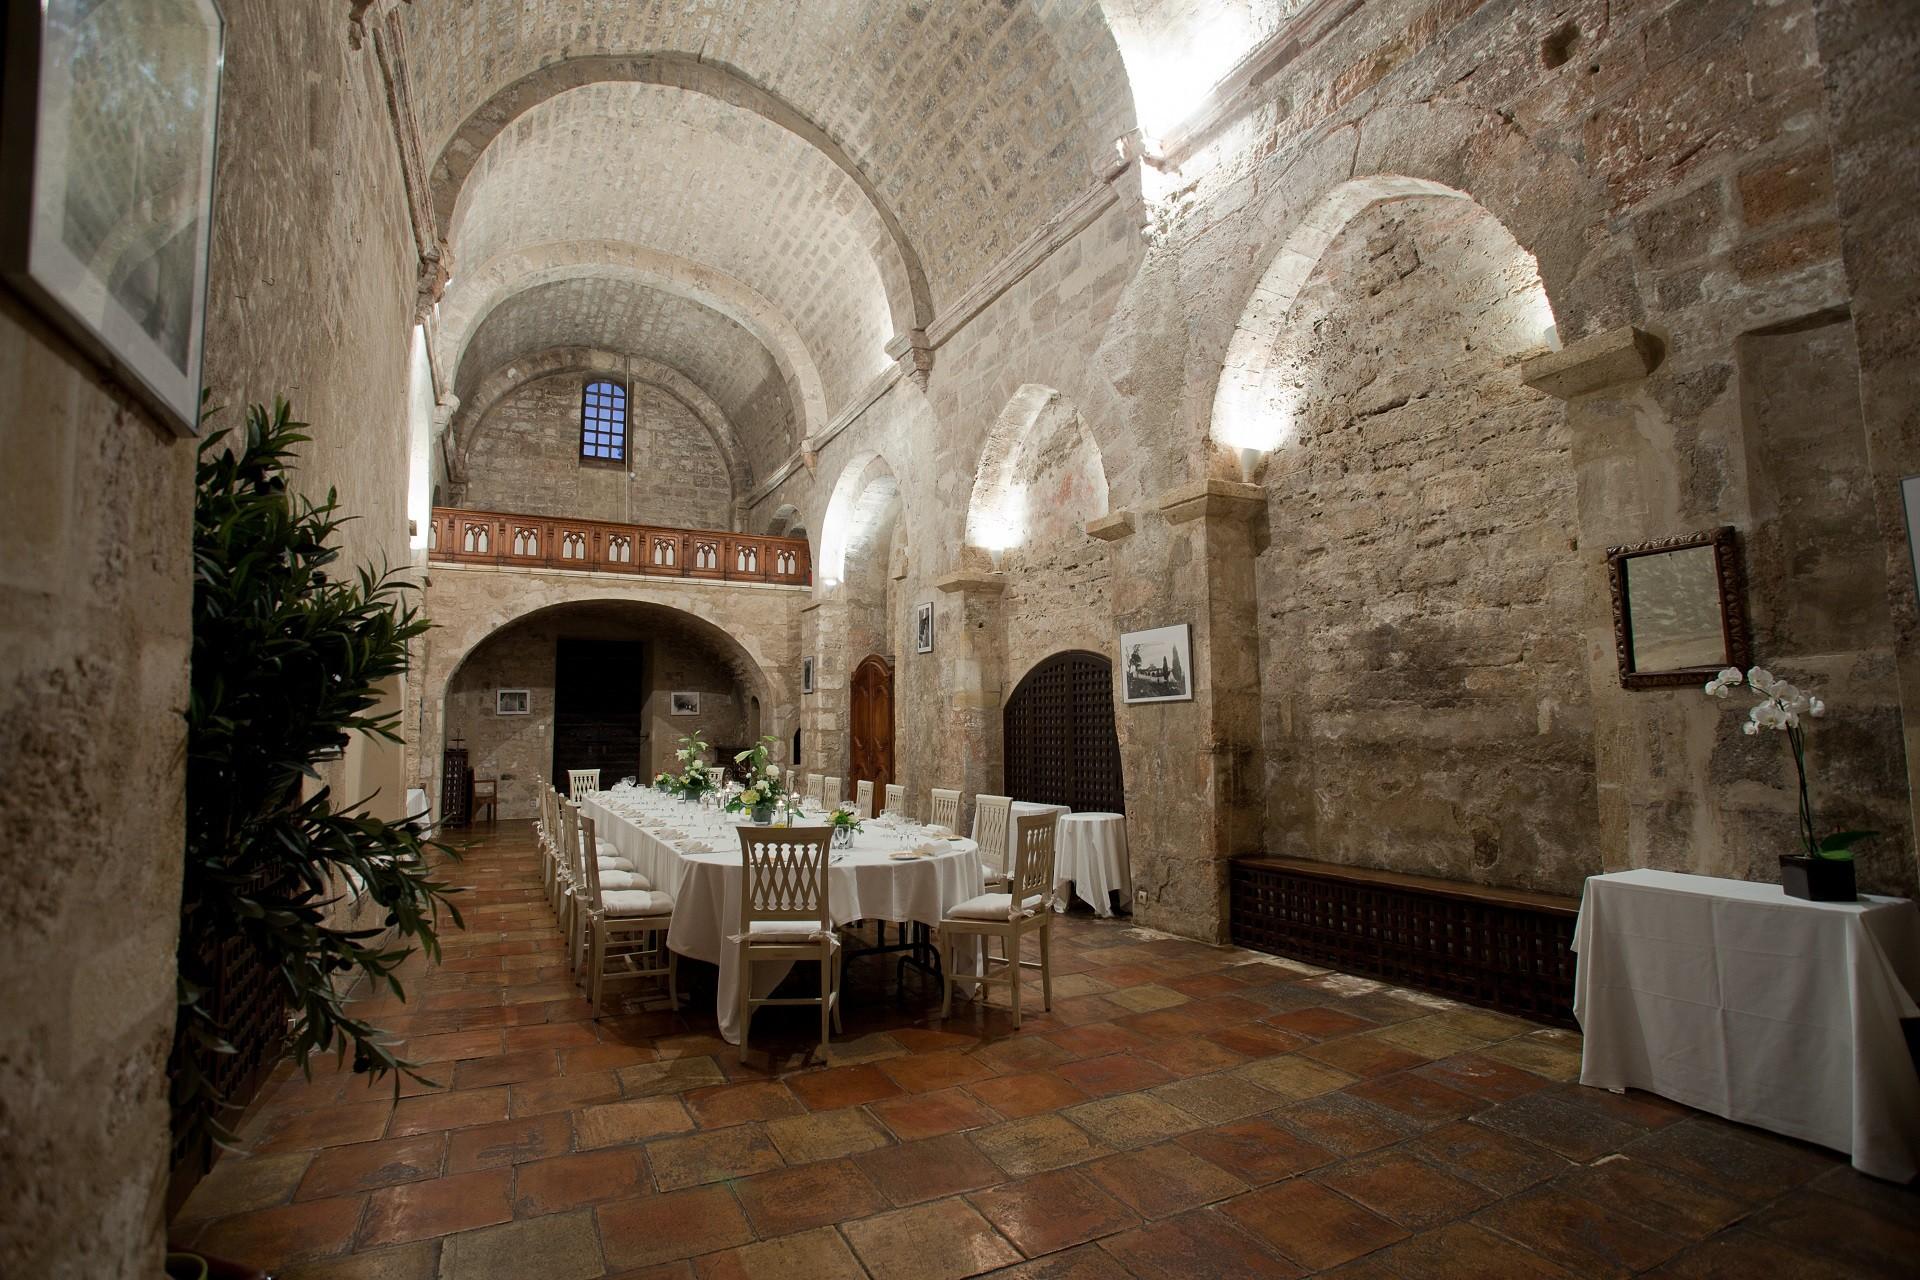 Abbaye-de-Sainte-Croix-provence-luberon--salle-a-manger-Seminaires-de-caractere